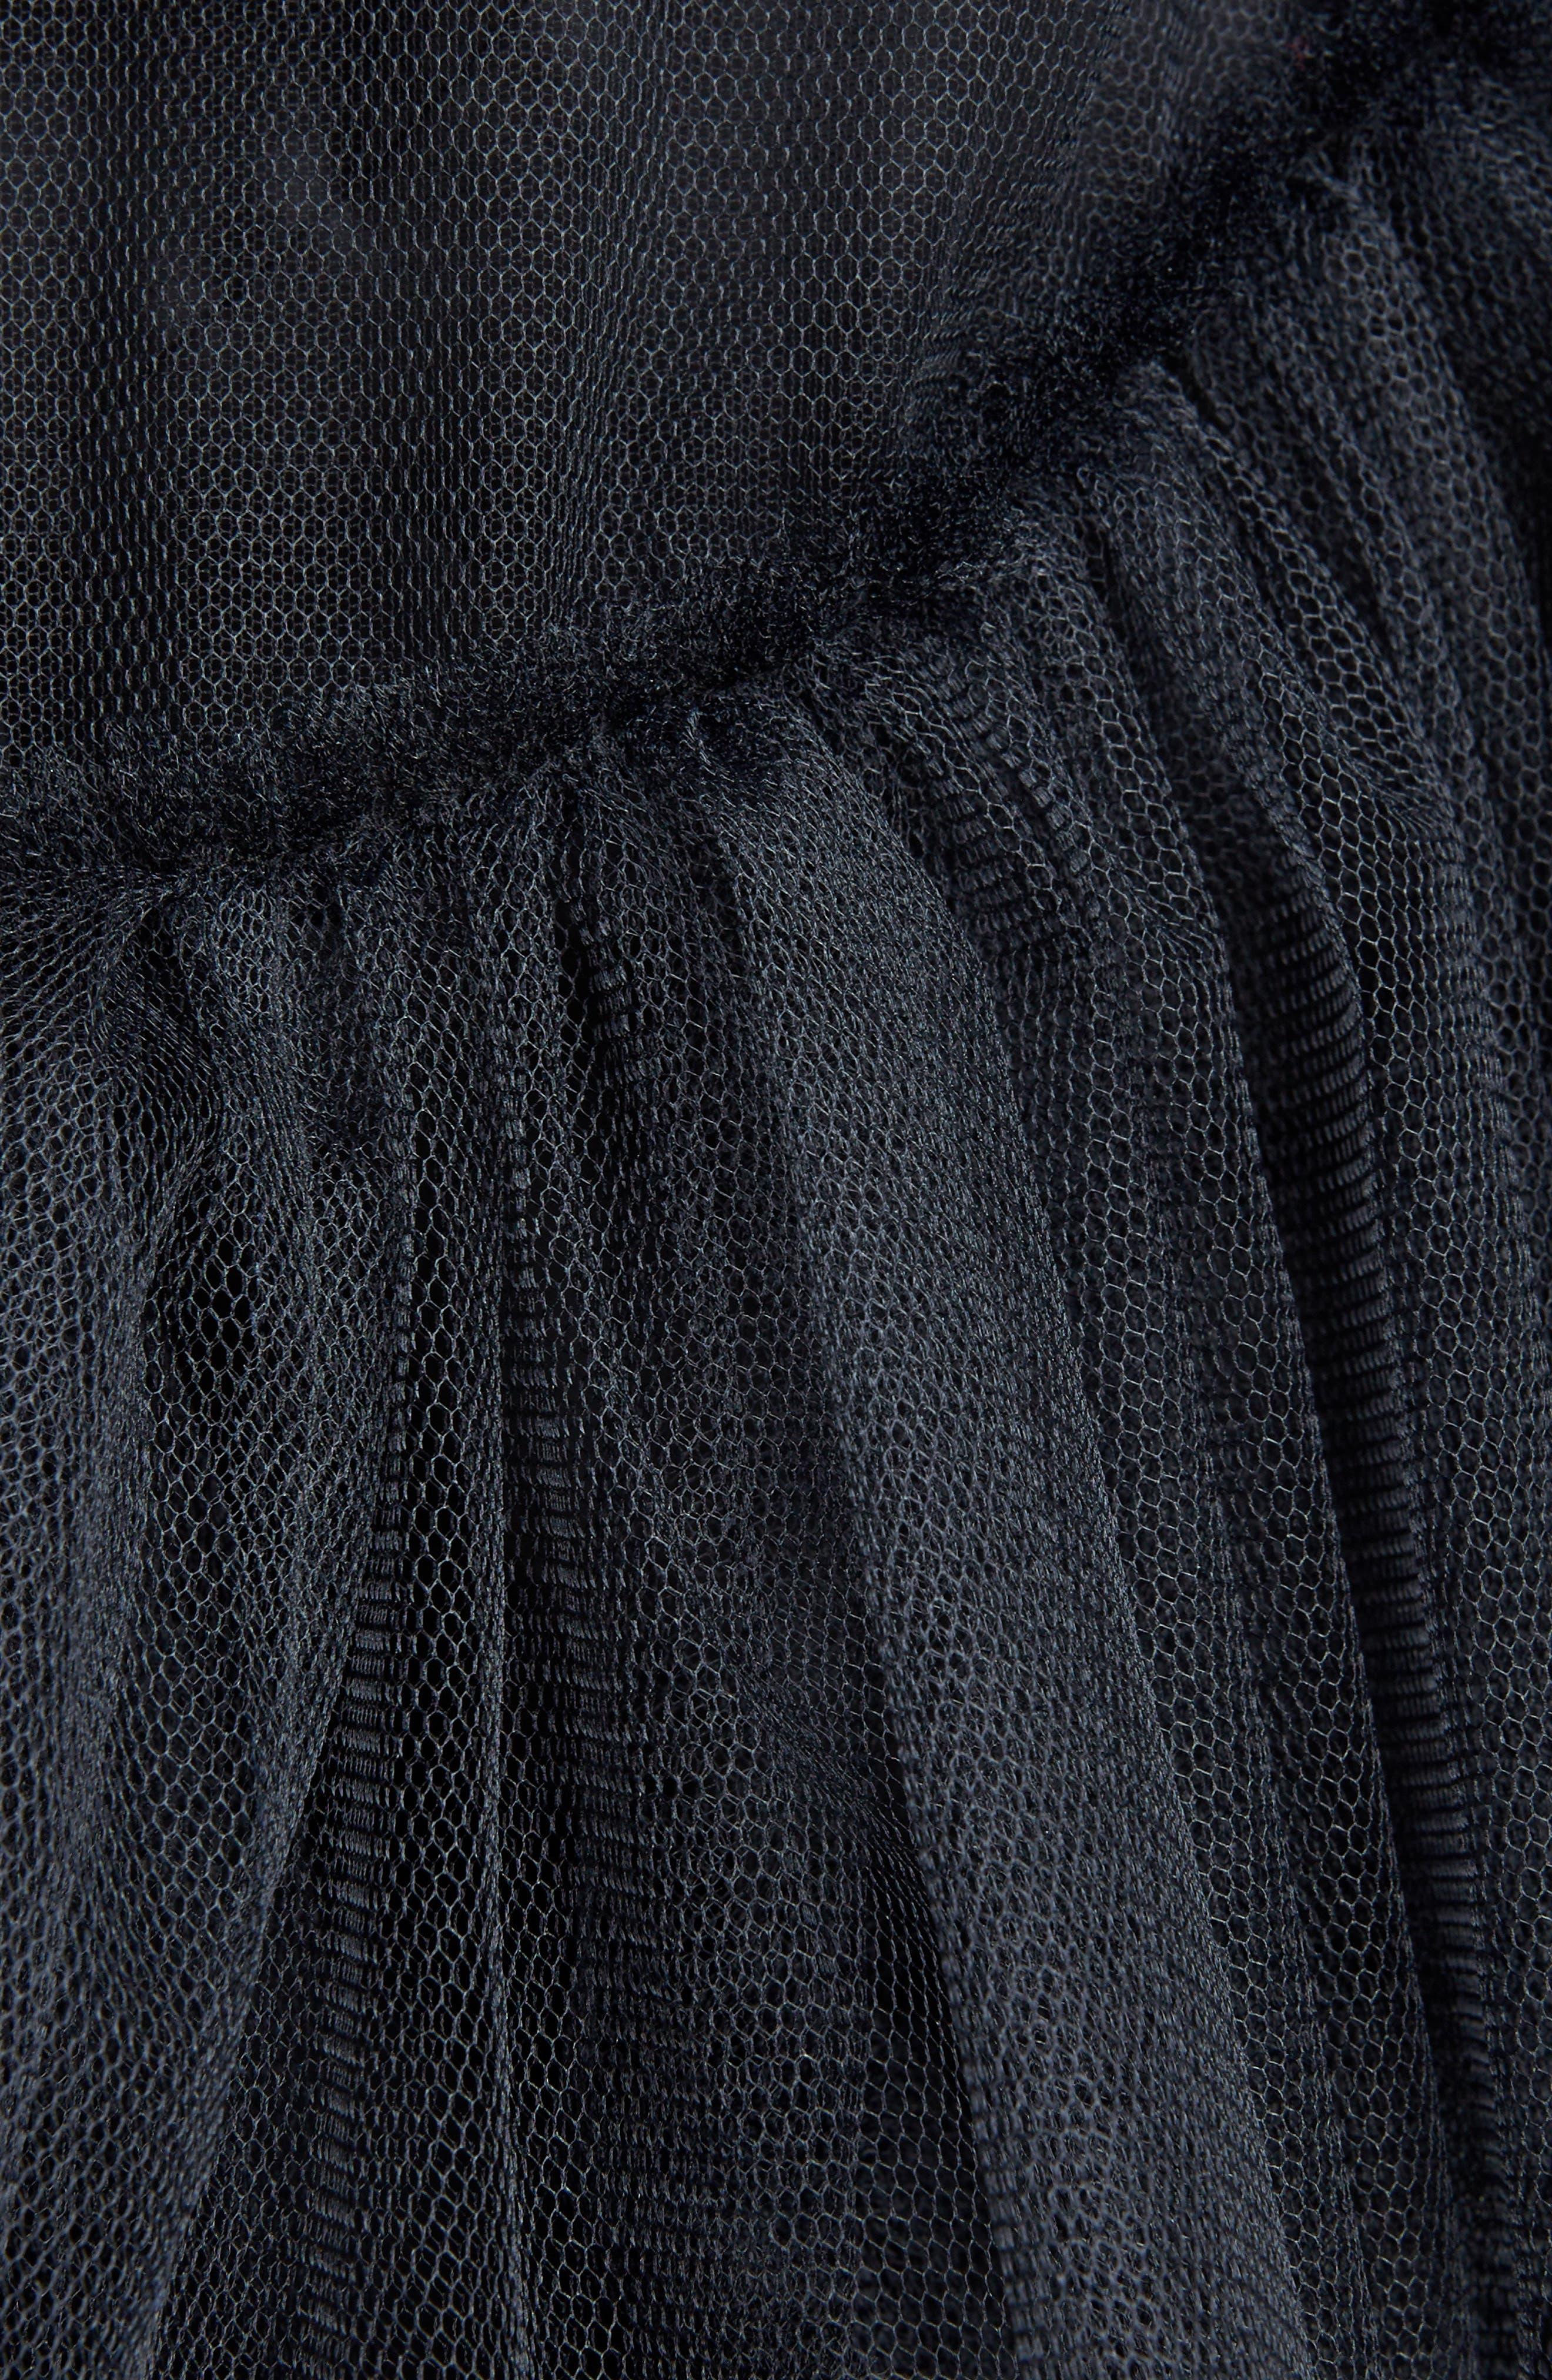 Turbo Tiered Tulle Dress,                             Alternate thumbnail 5, color,                             Black